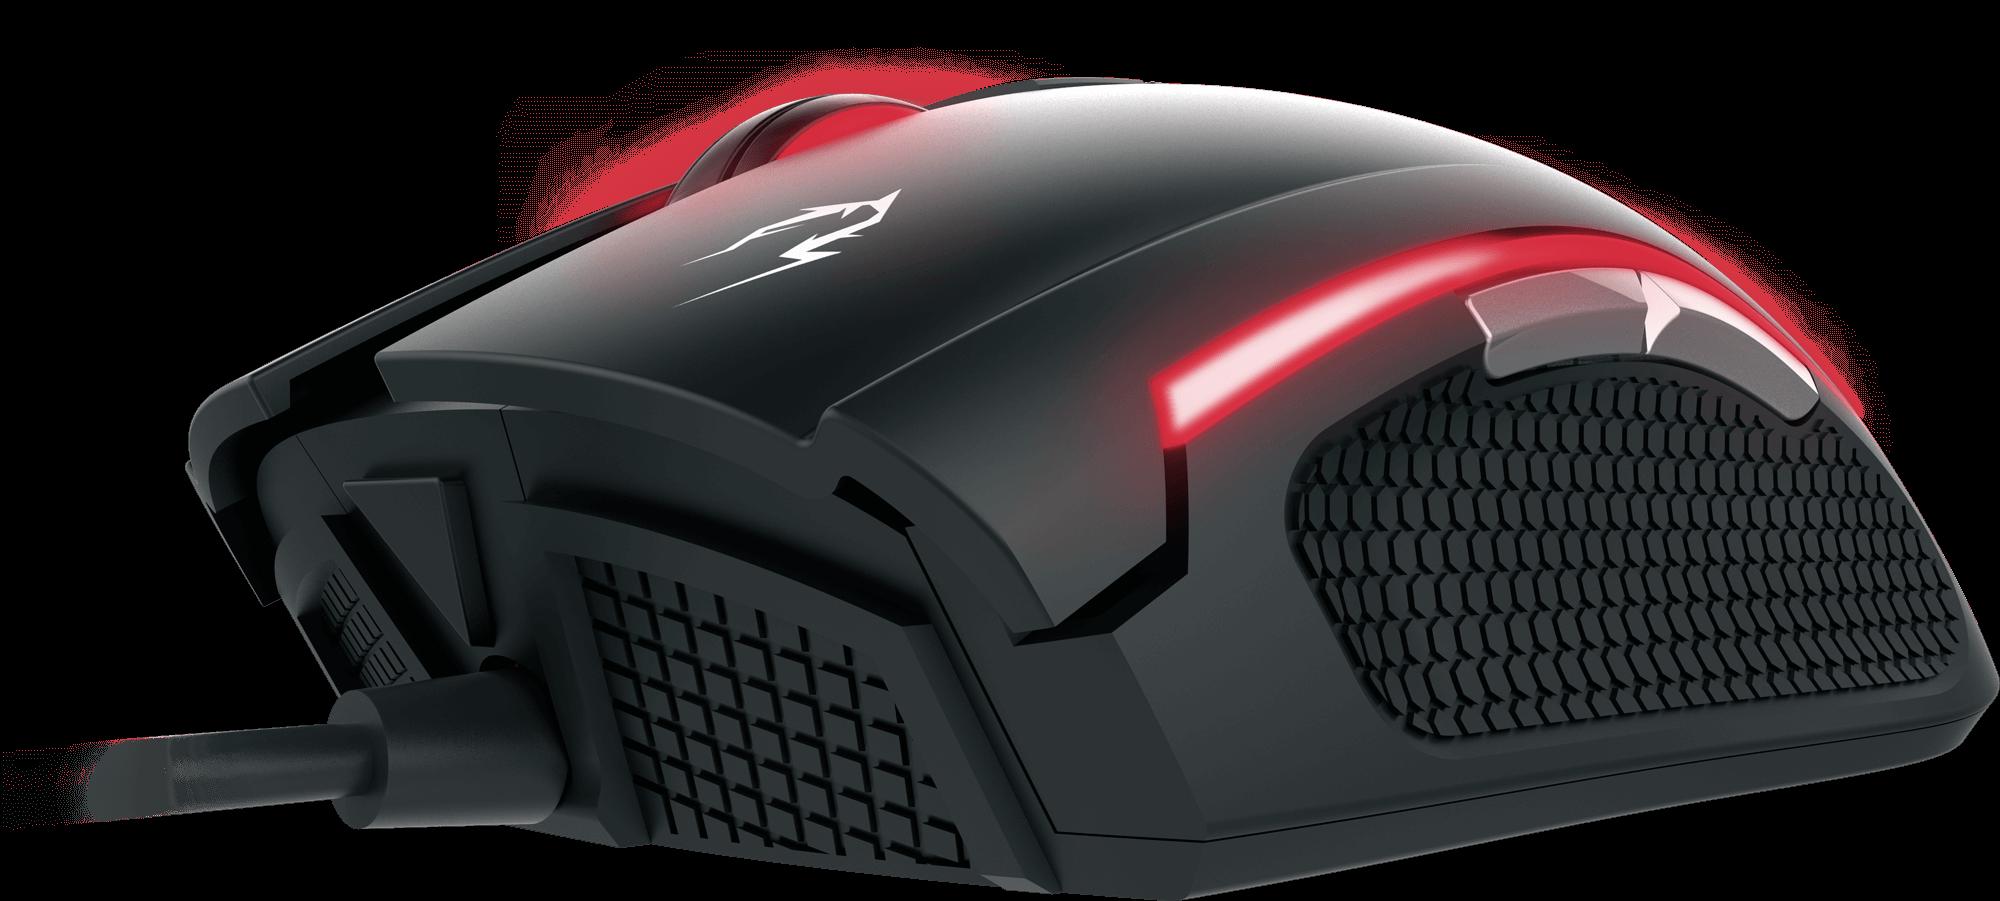 Combo Gamer Teclado Mouse e Headset Gamdias Poseidon M1  -  Games Lord